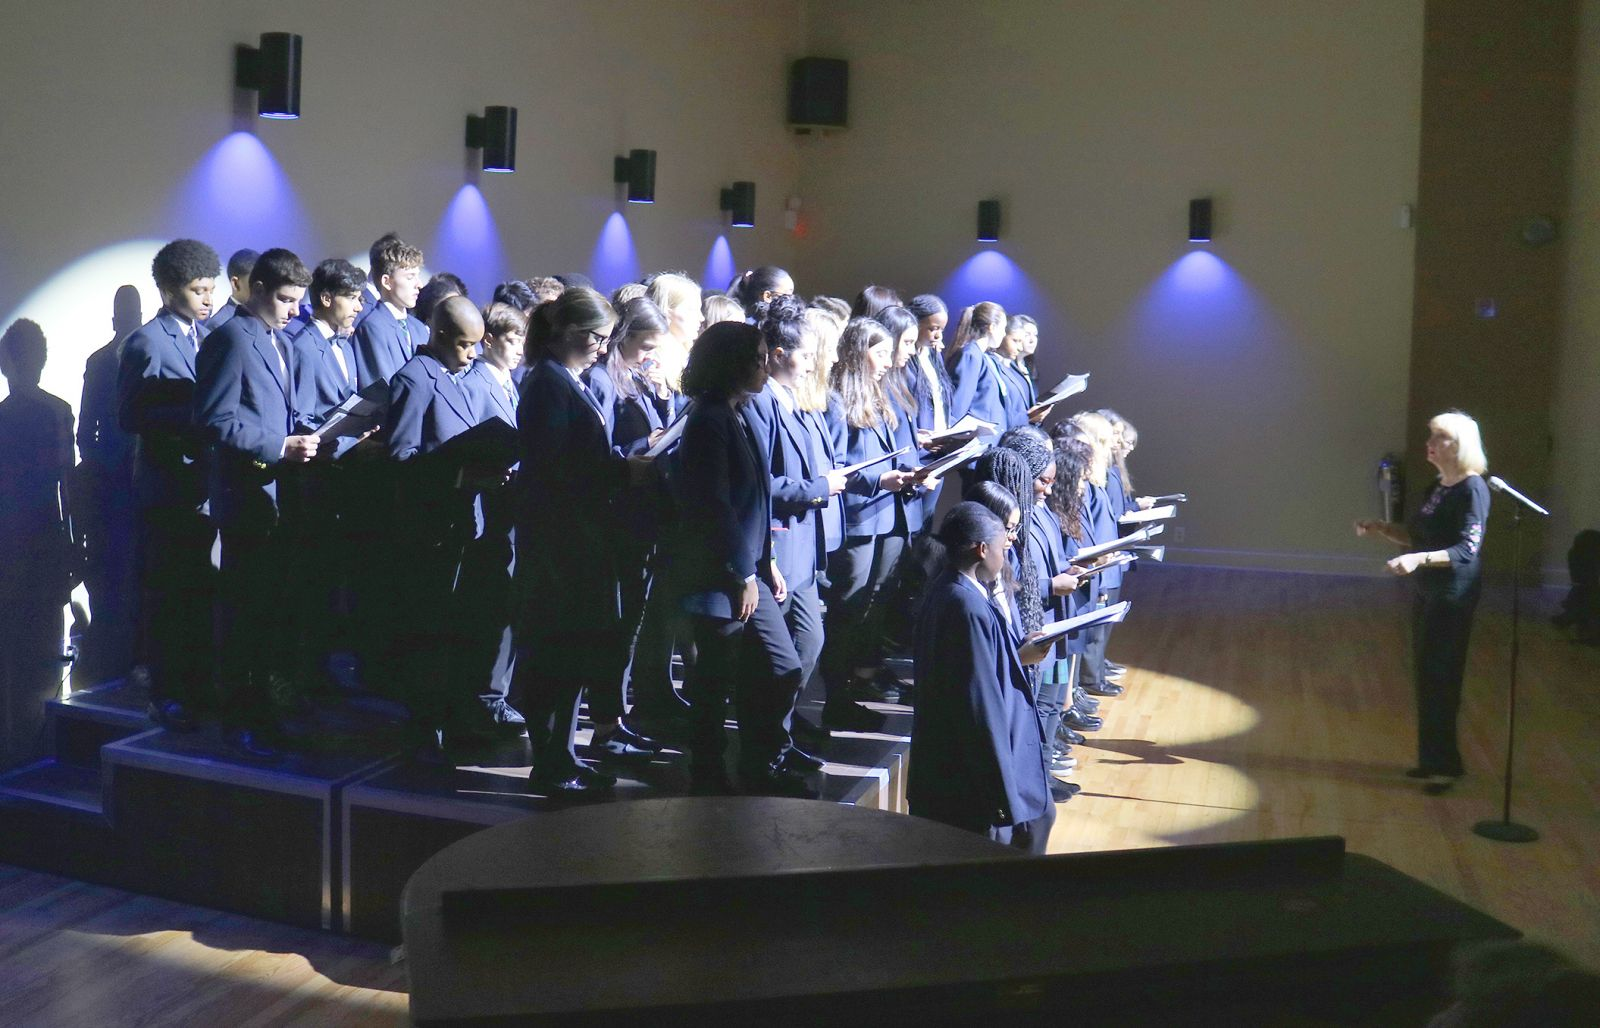 Науковою лекцією та концертом в Нью-Йорку вшановано жертв Голодомору